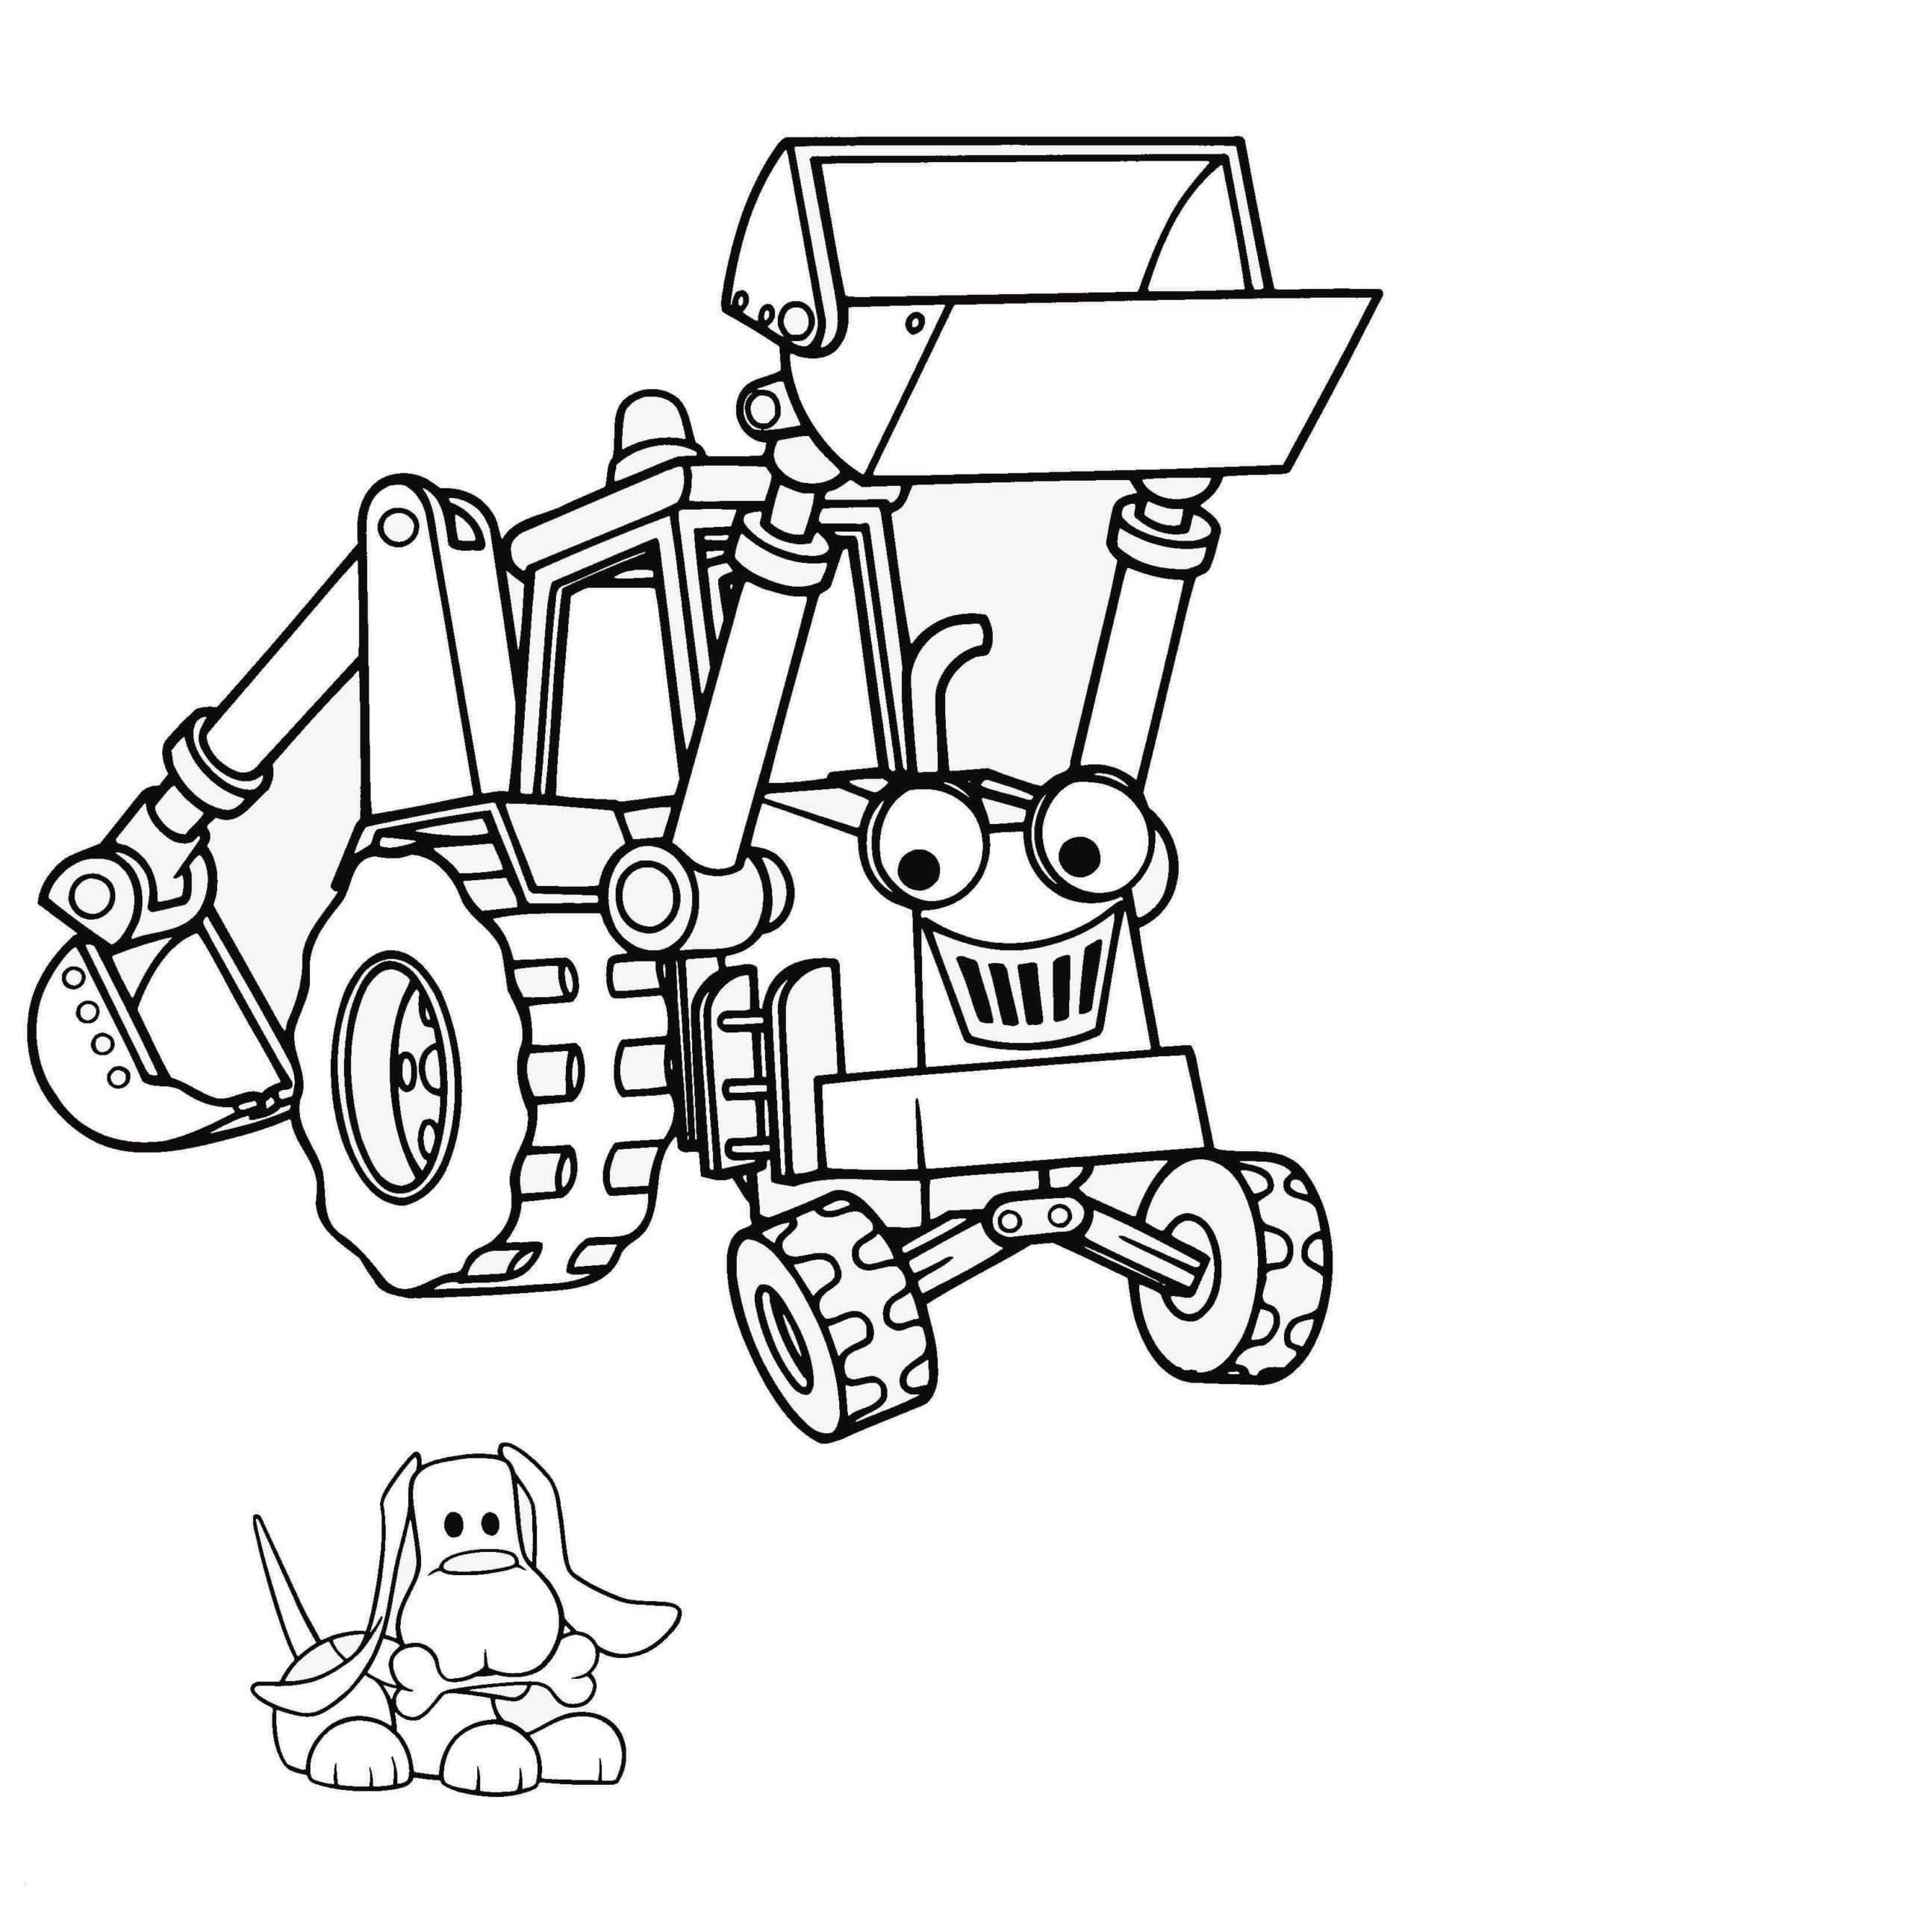 Раскраска экскаватор-робот на vipraskraski.ru